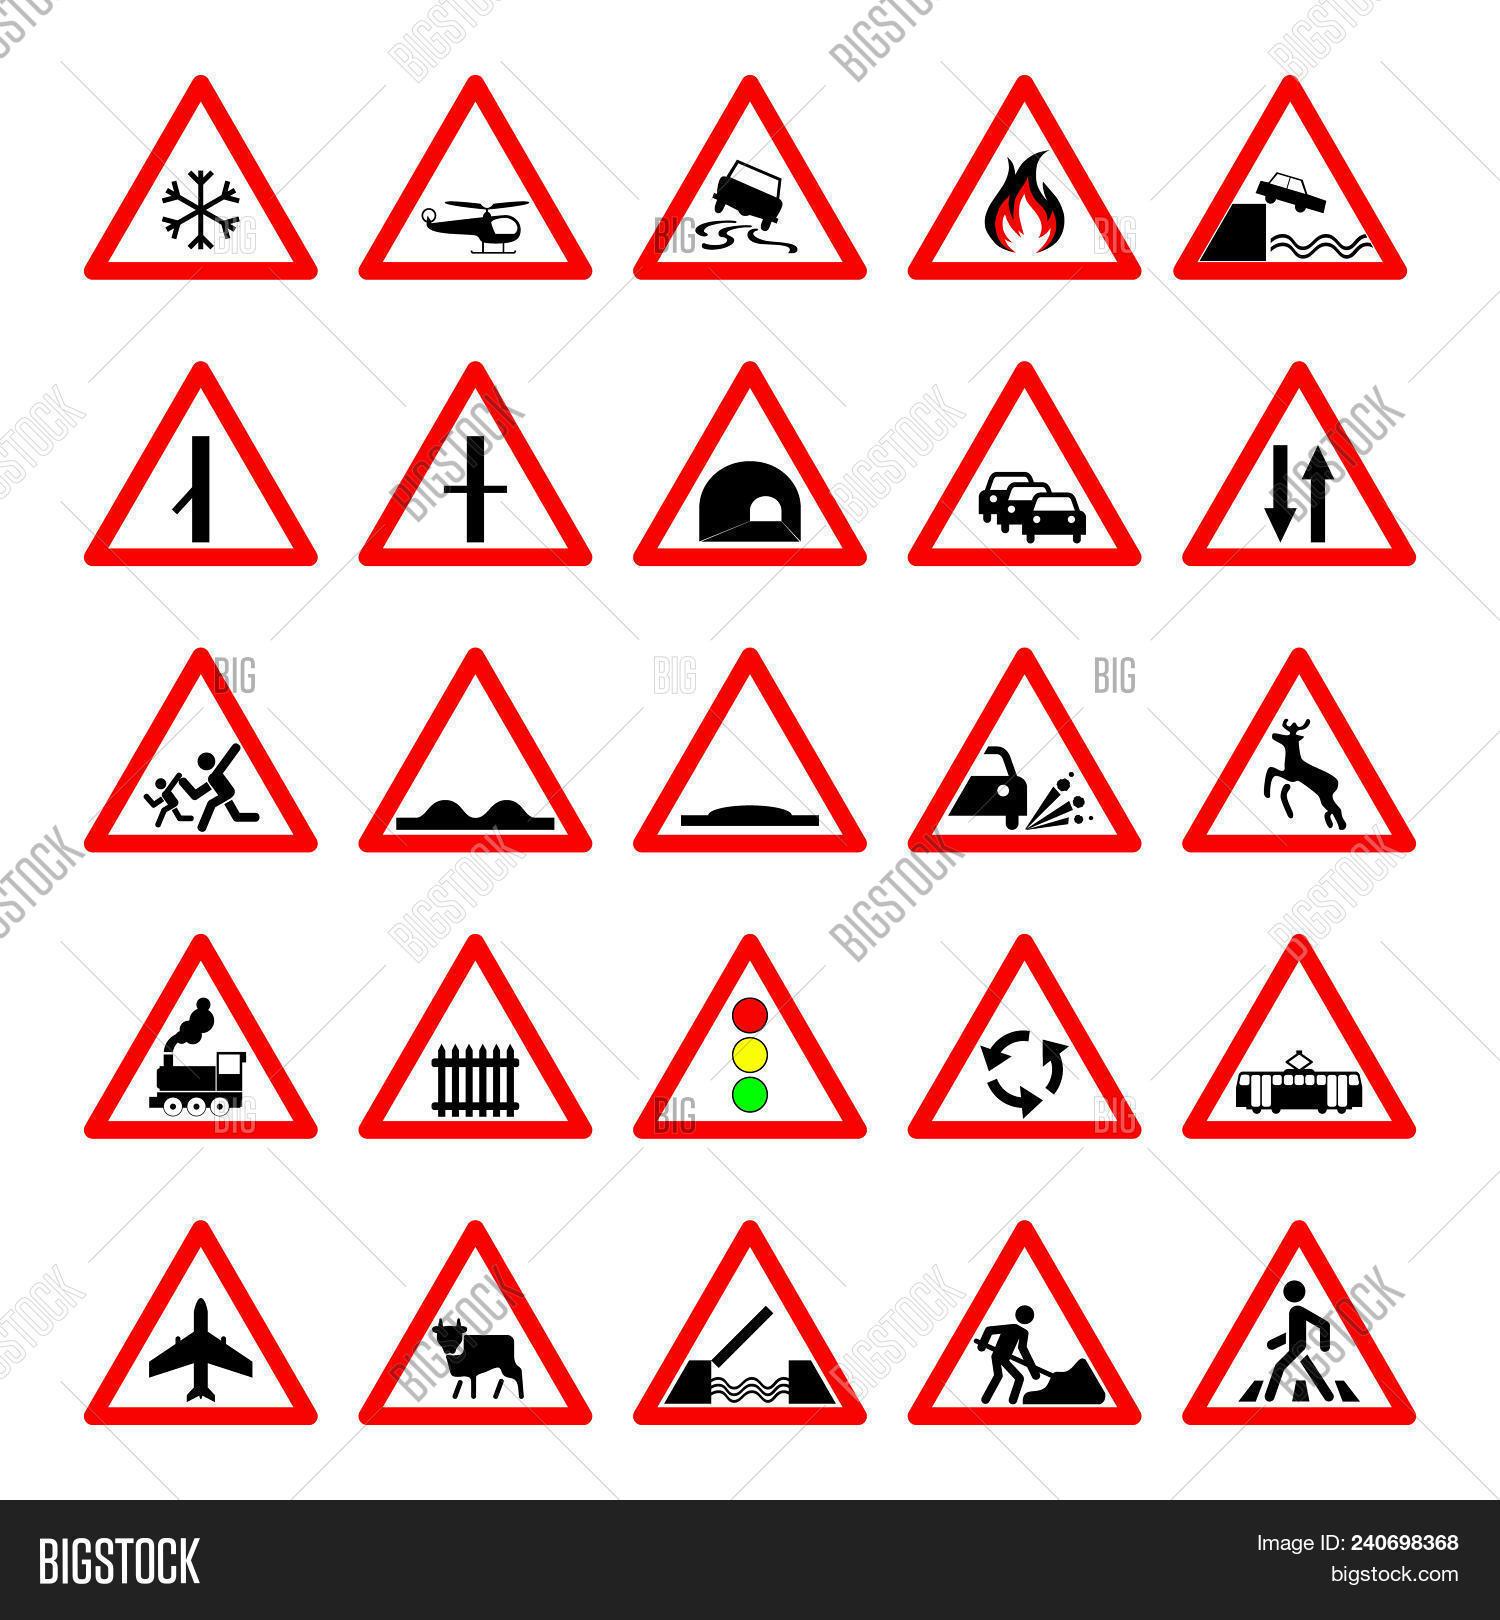 Triangle Road Signs >> Set Road Hazard Image Photo Free Trial Bigstock